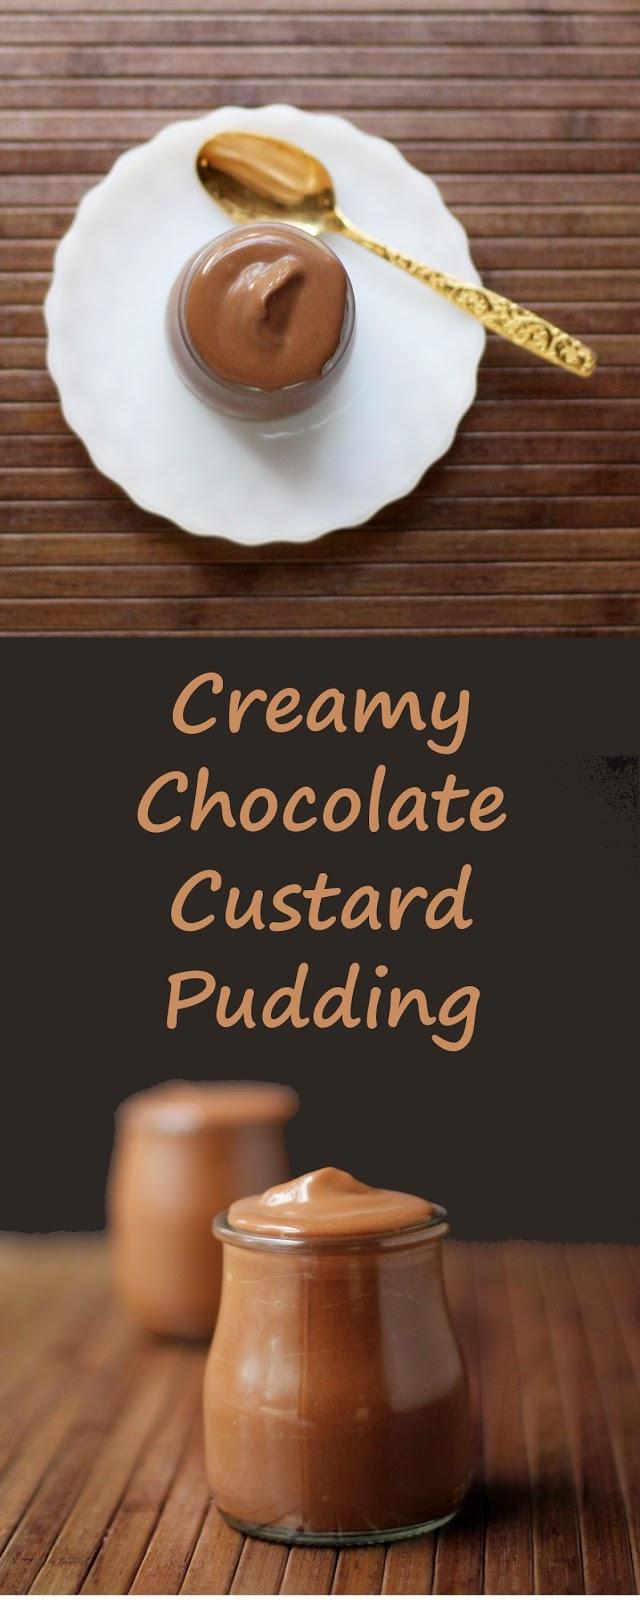 Chocolate custard pudding - the ultimate comfort food dessert.